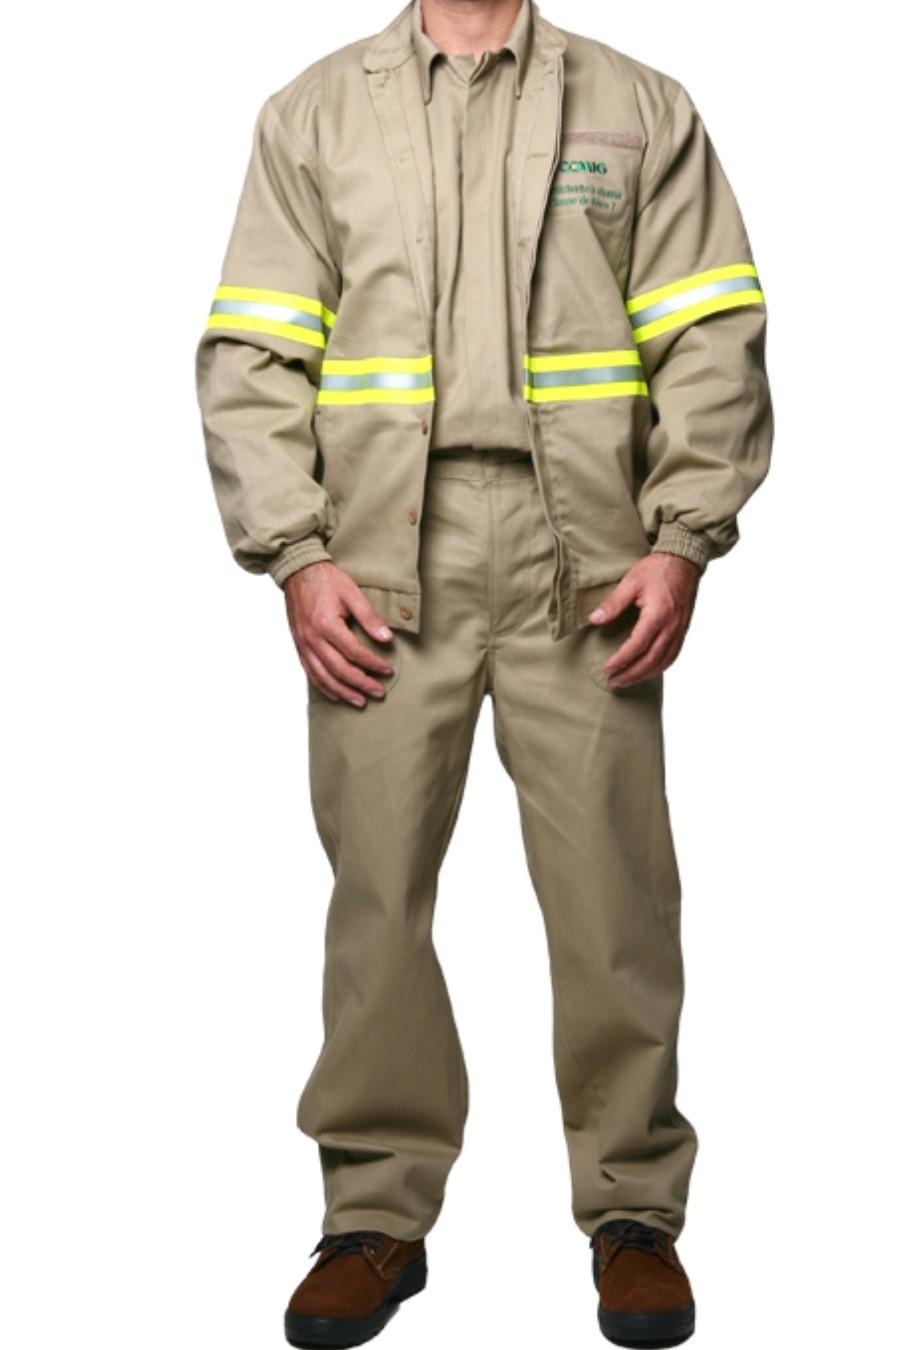 Jaqueta de Segurança 10,0 CAL/CM² - Risco II